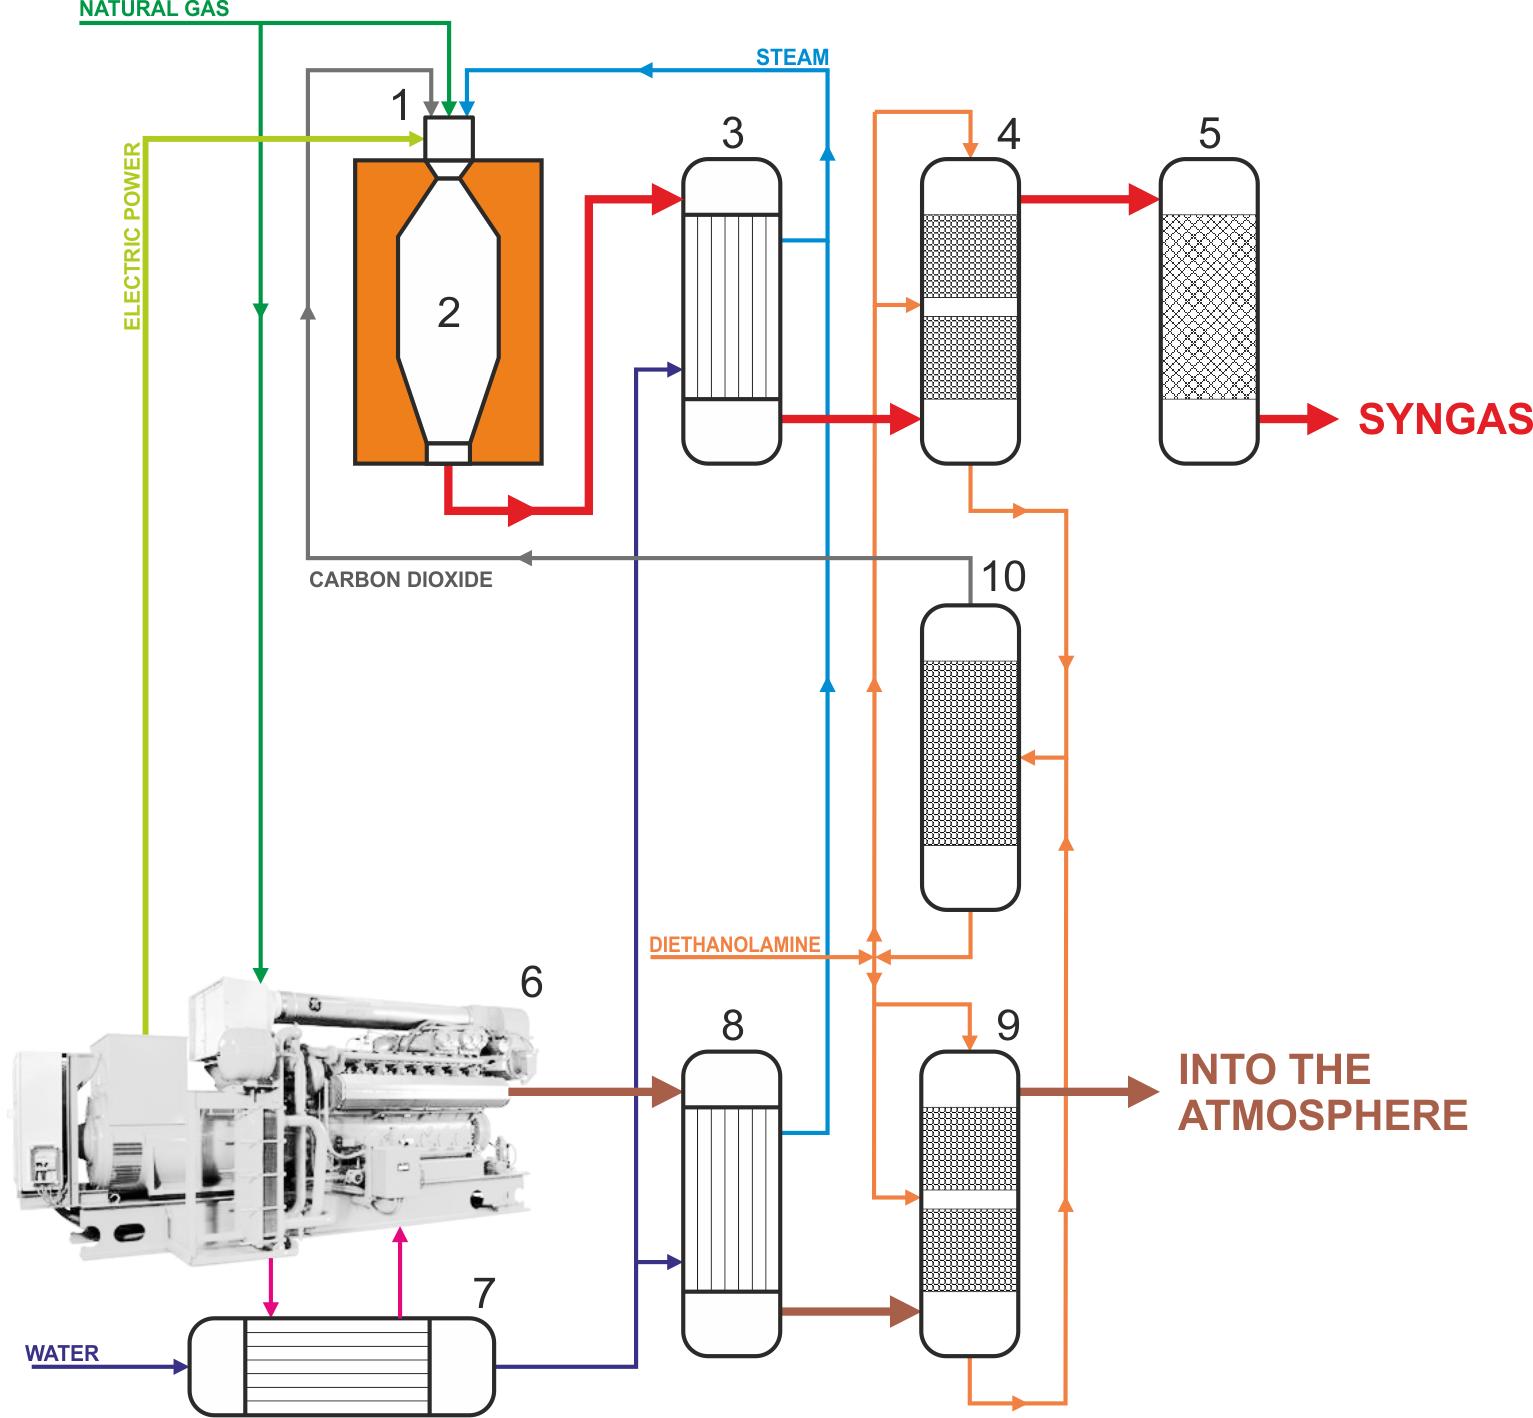 Conversion of natural gas